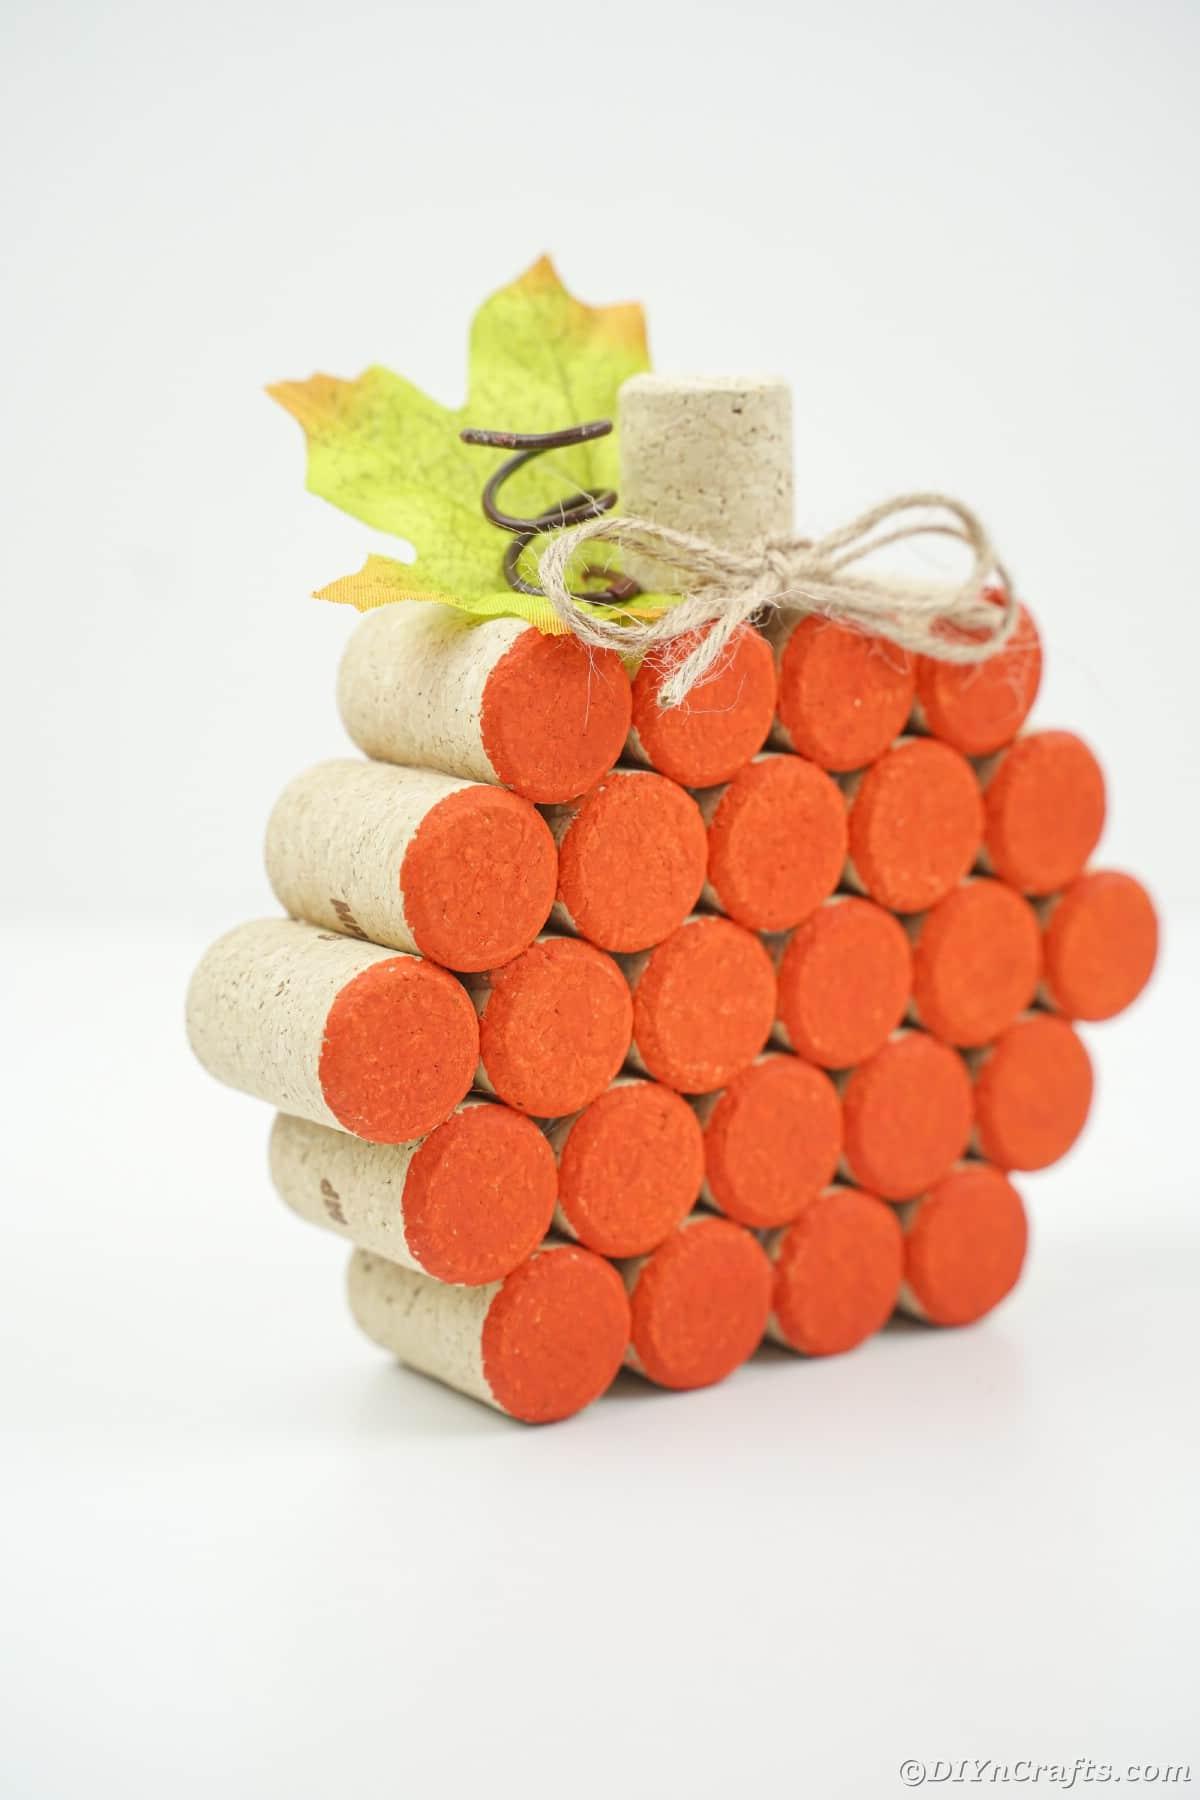 orange pumpkin made of cork on white table